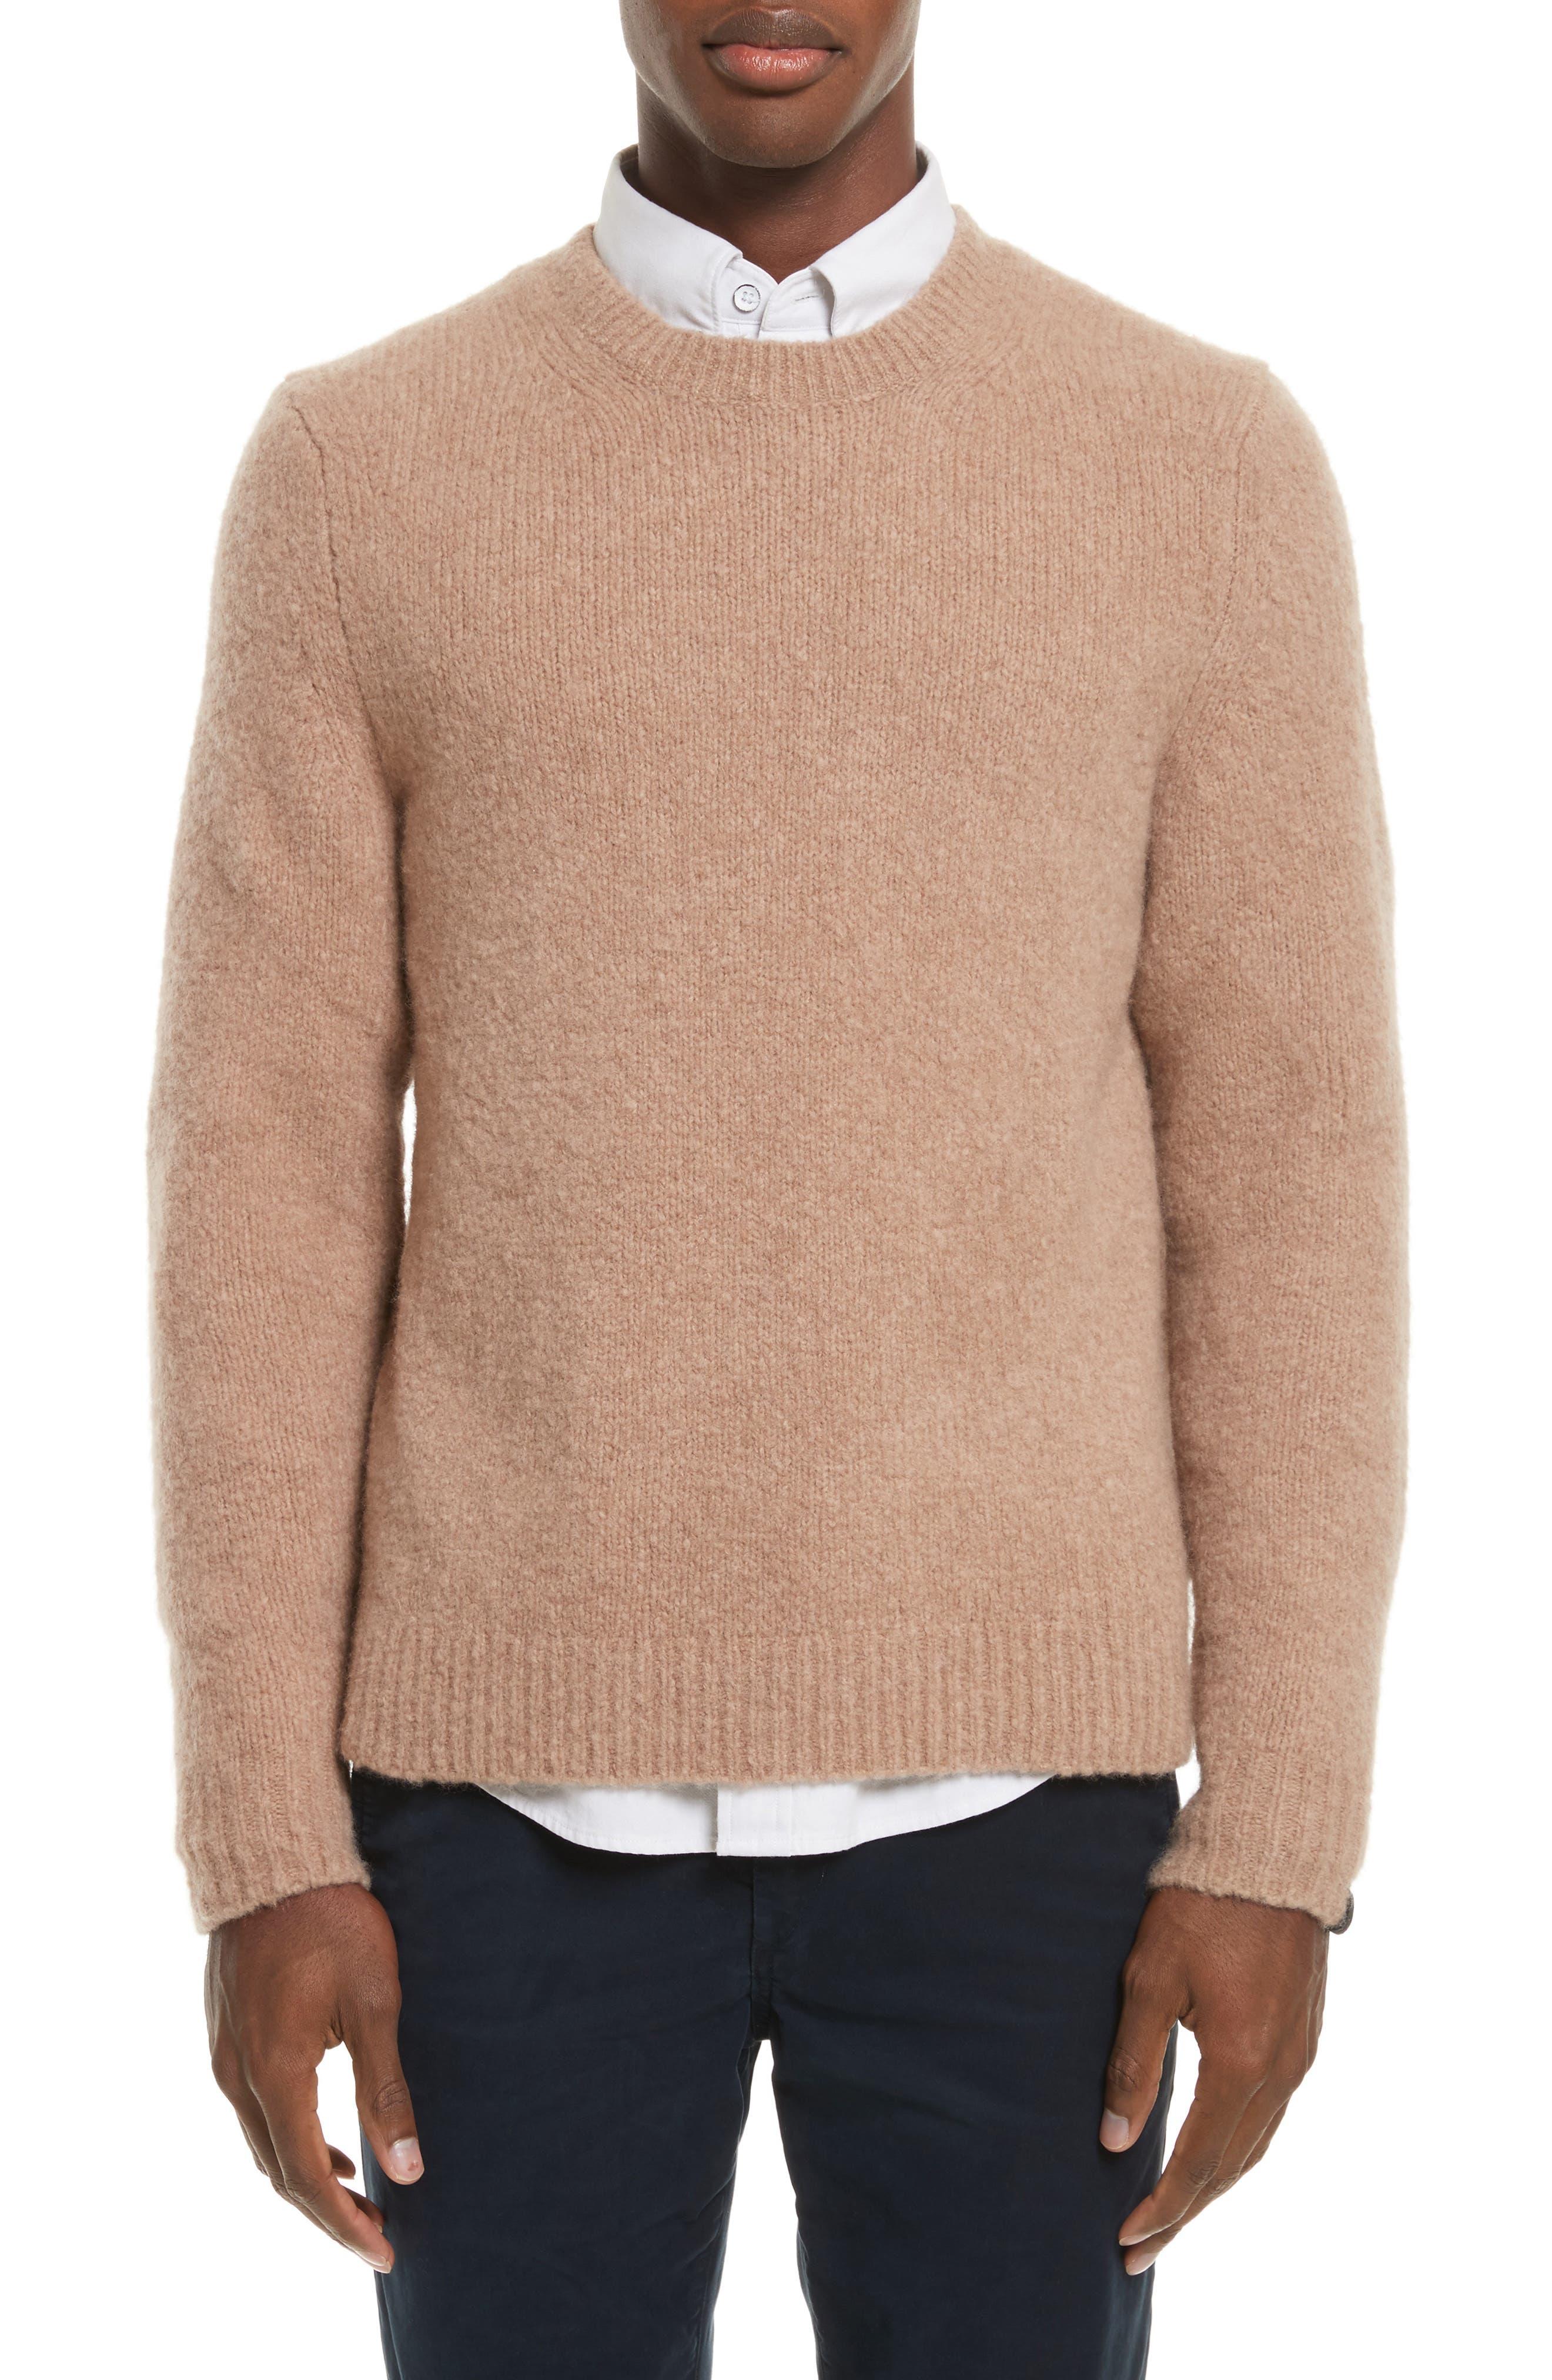 Charles Merino Wool Blend Sweater,                             Main thumbnail 1, color,                             230